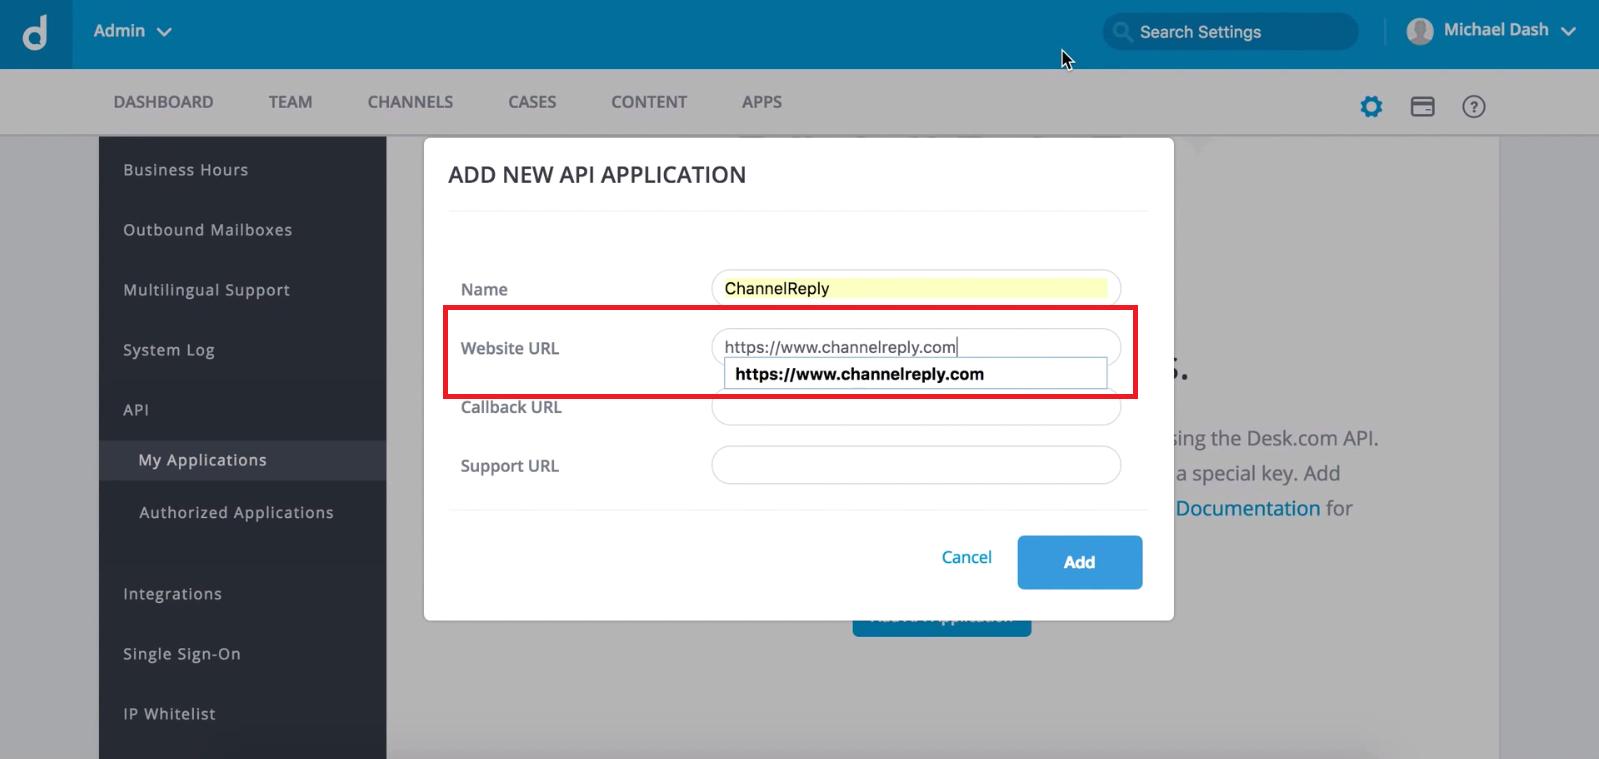 Add New Application Pop-Up